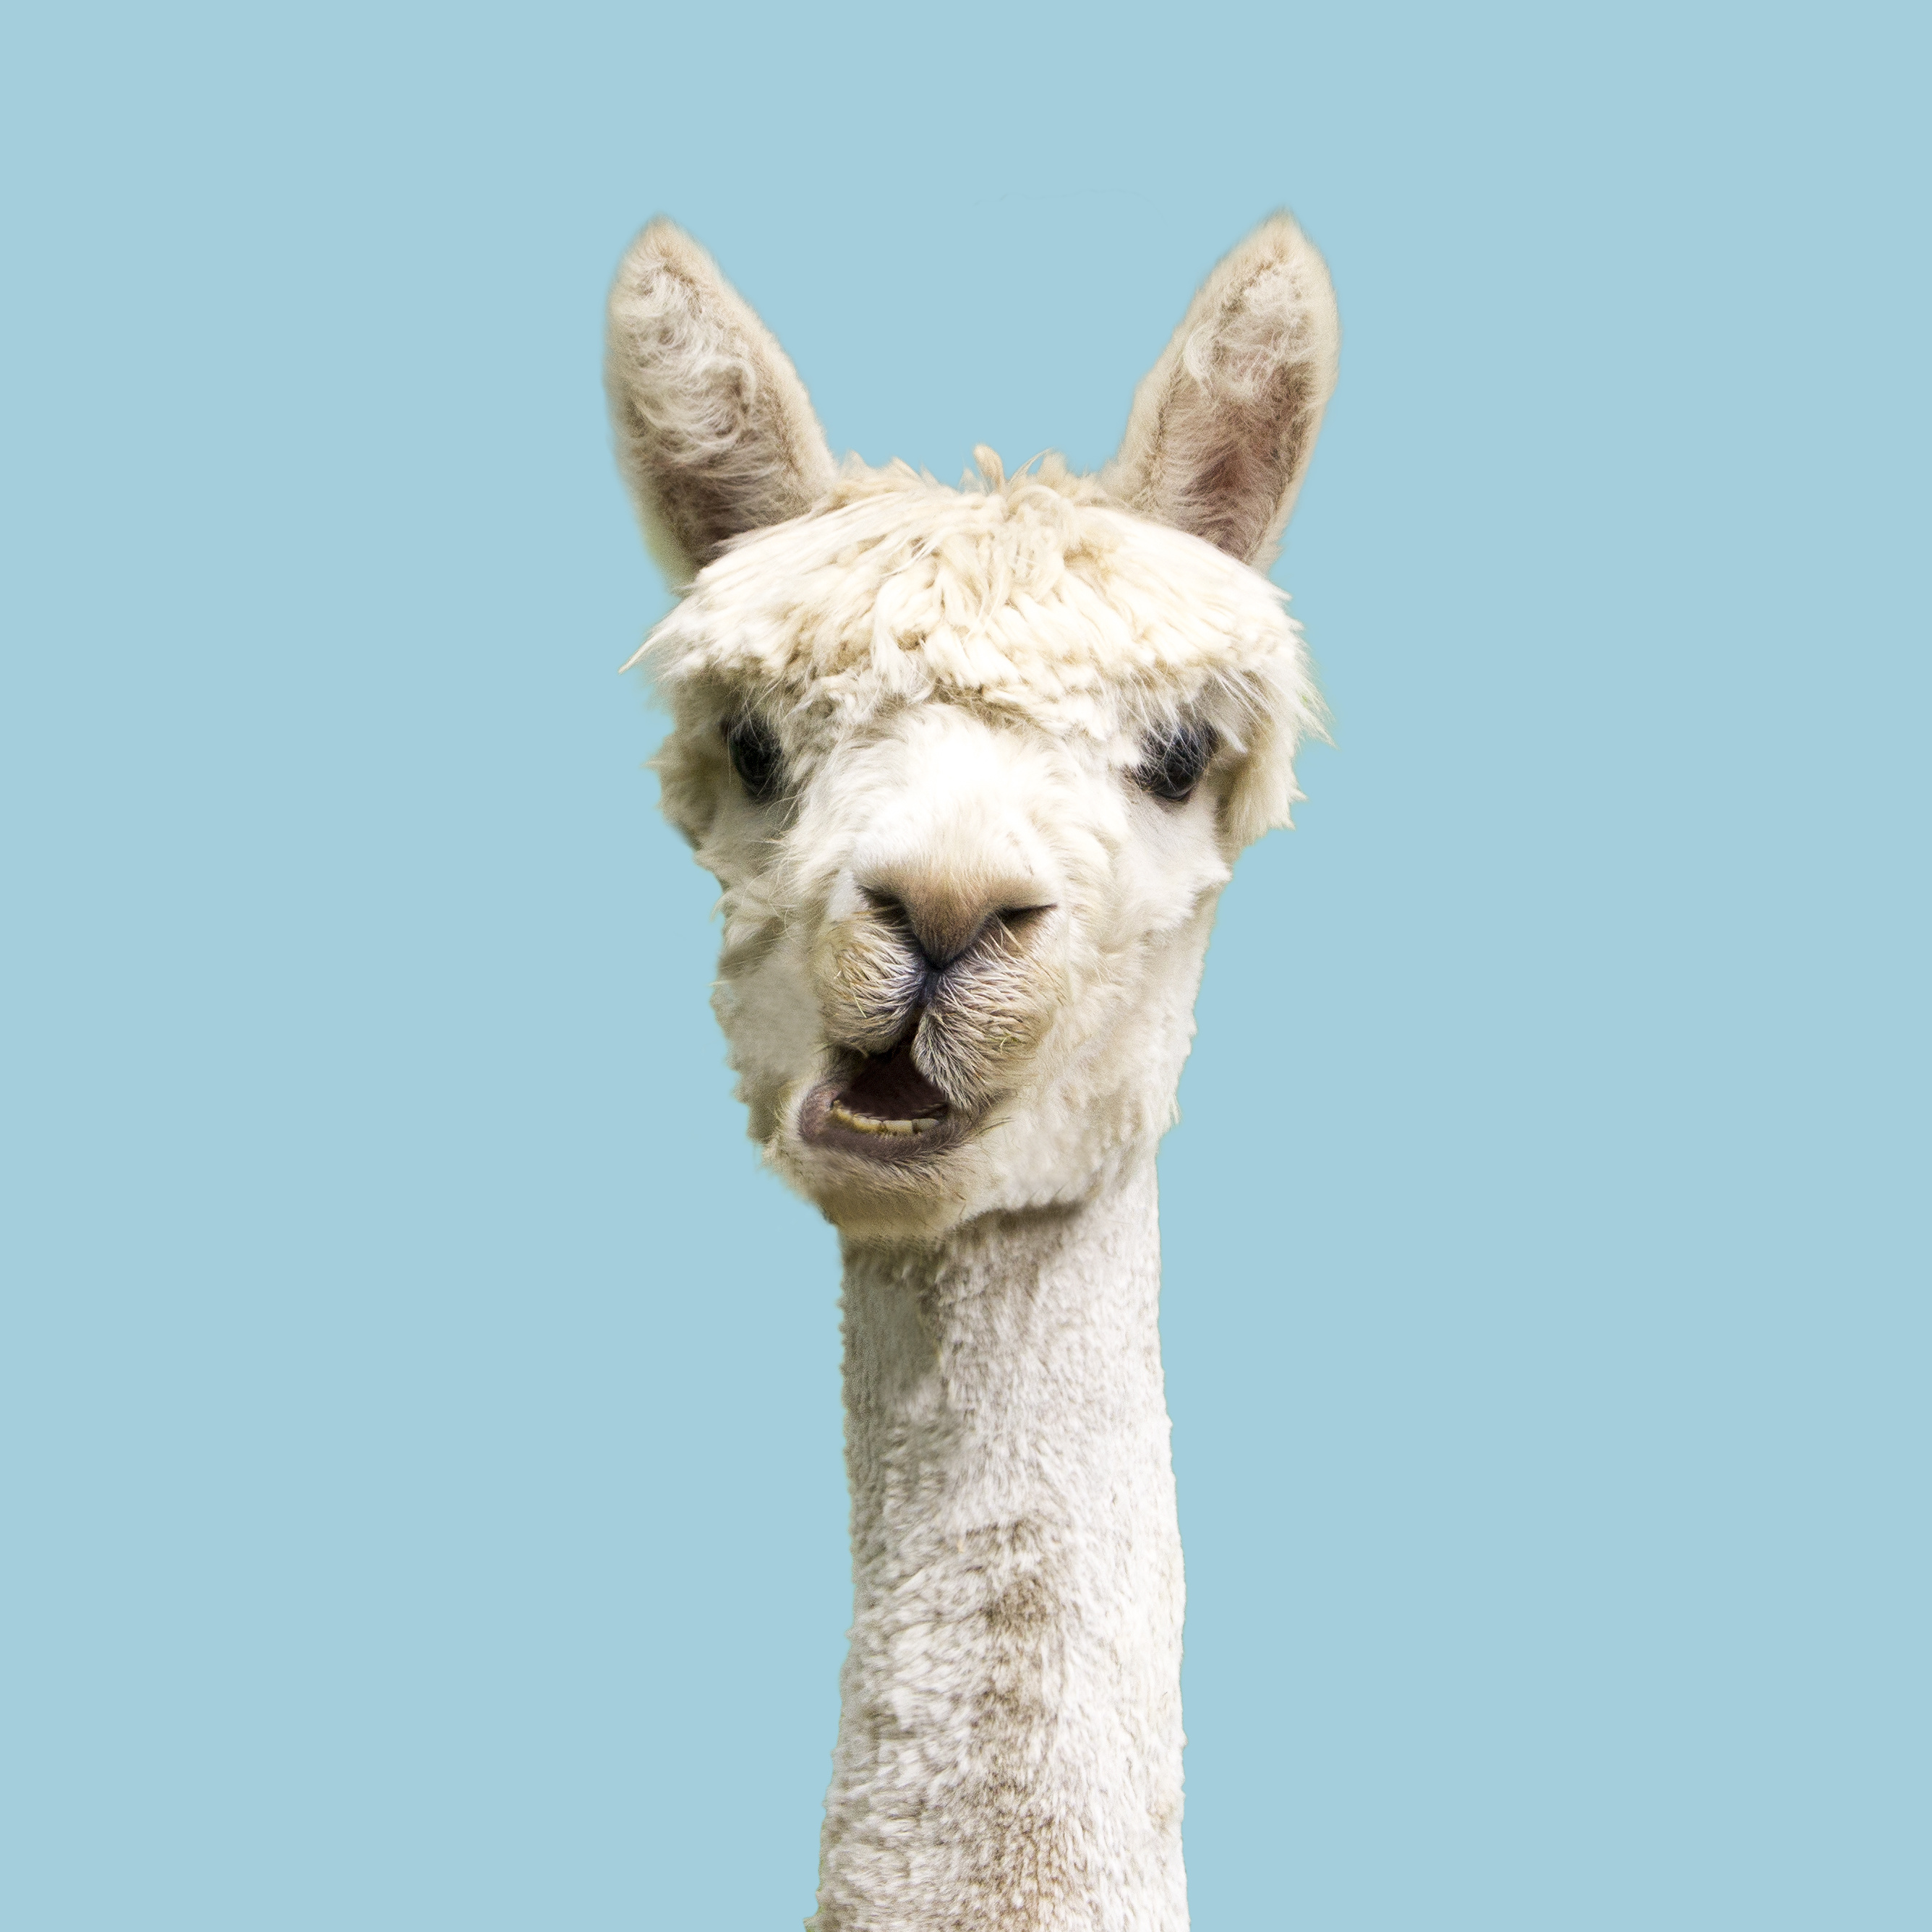 Des anticorps de lama pourraient constituer la base du futur vaccin anti-COVID-19 (Visuel AdobeStock_294019074)